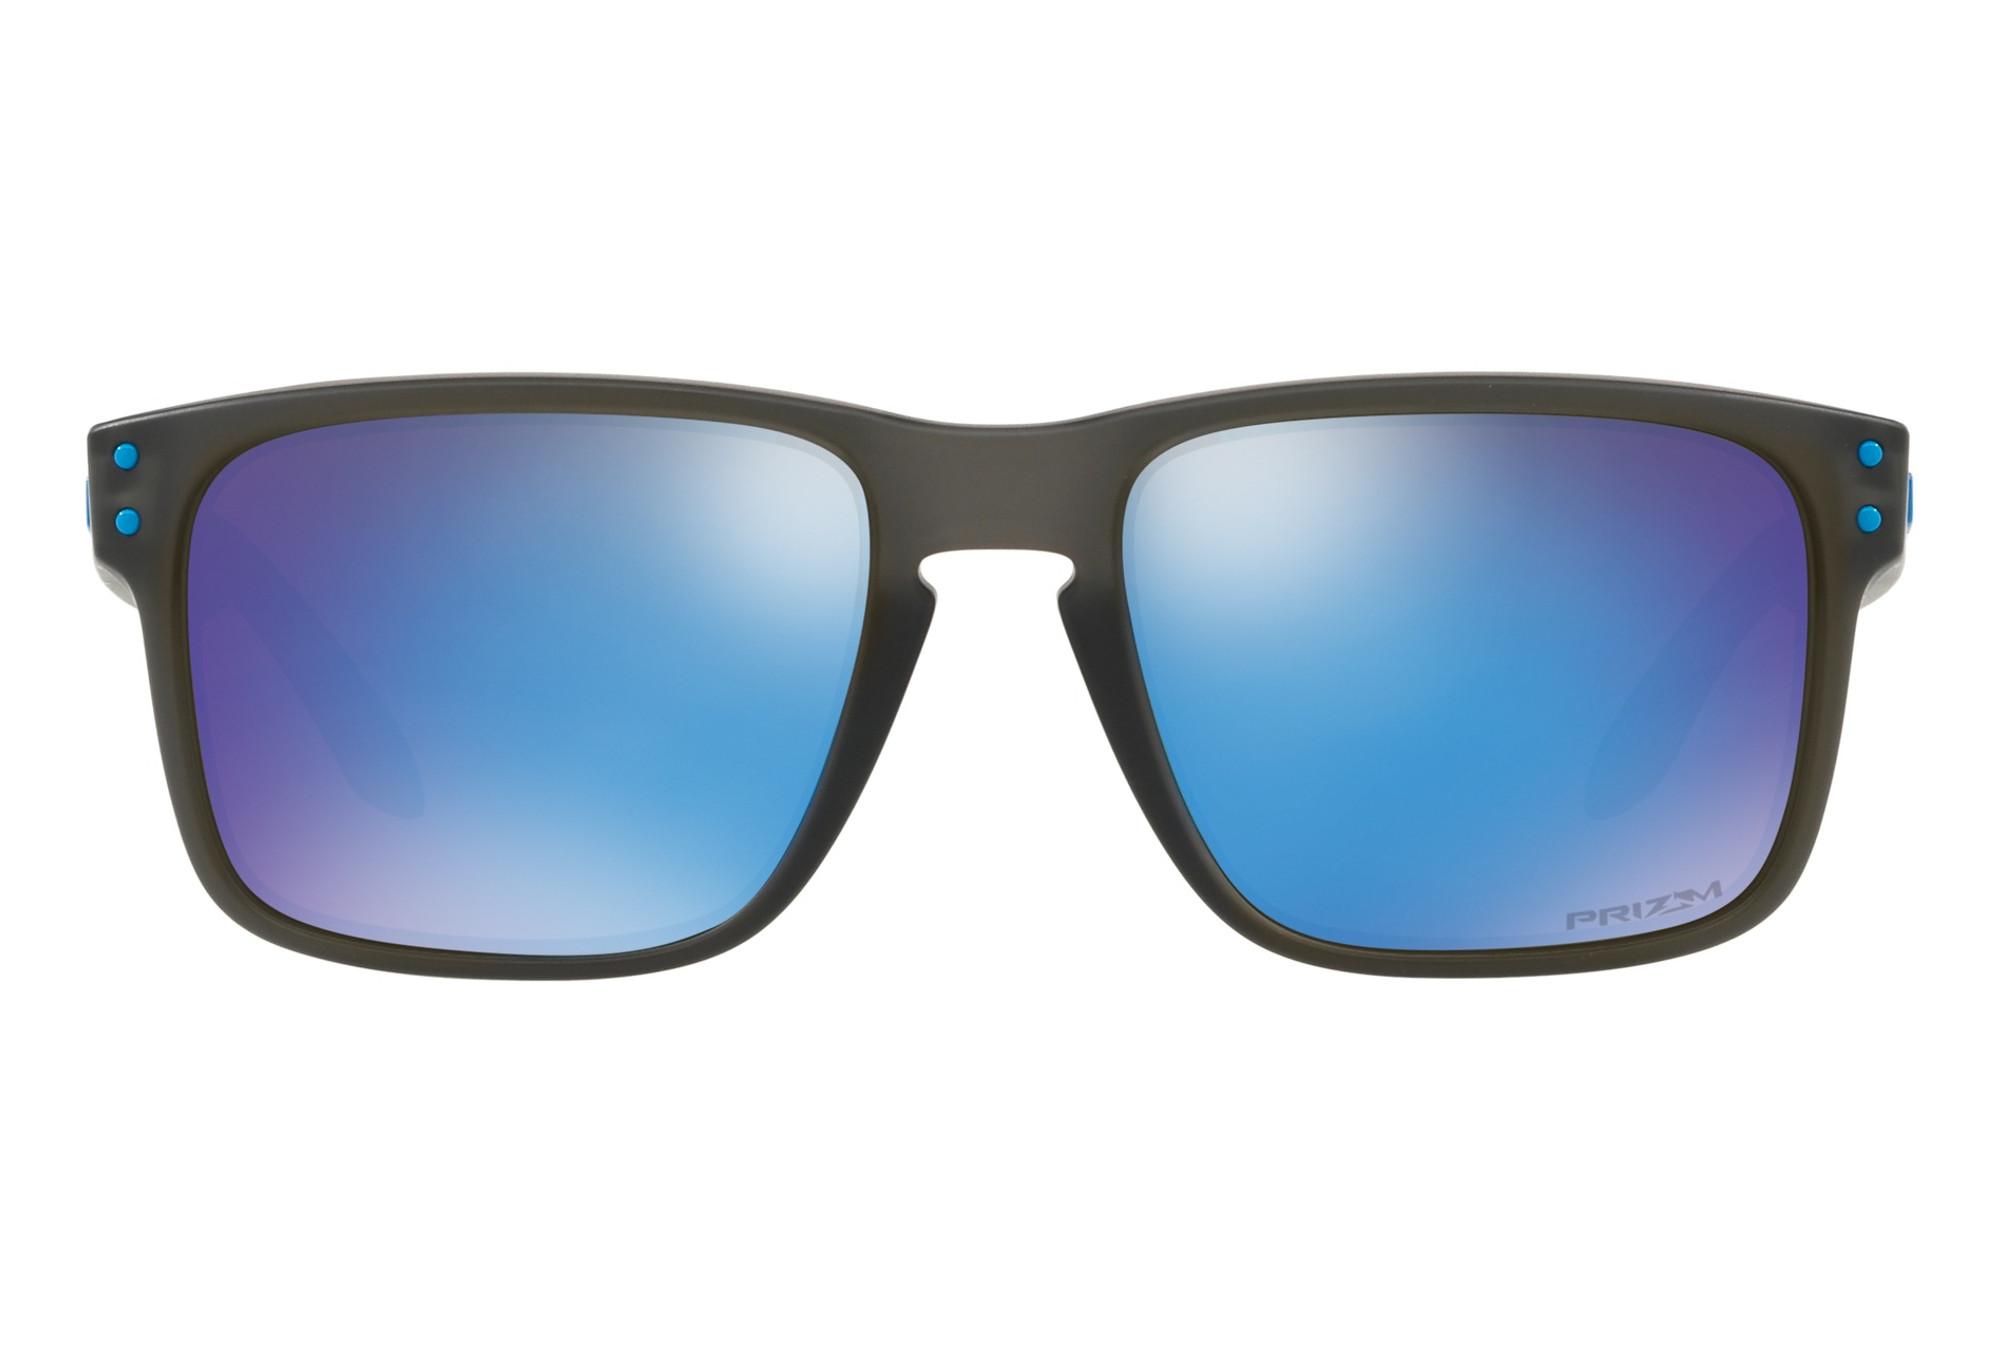 67774bcfe71eb7 Oakley Holbrook Sunglasses Black Blue - Prizm Sapphire OO9102-F255 ...